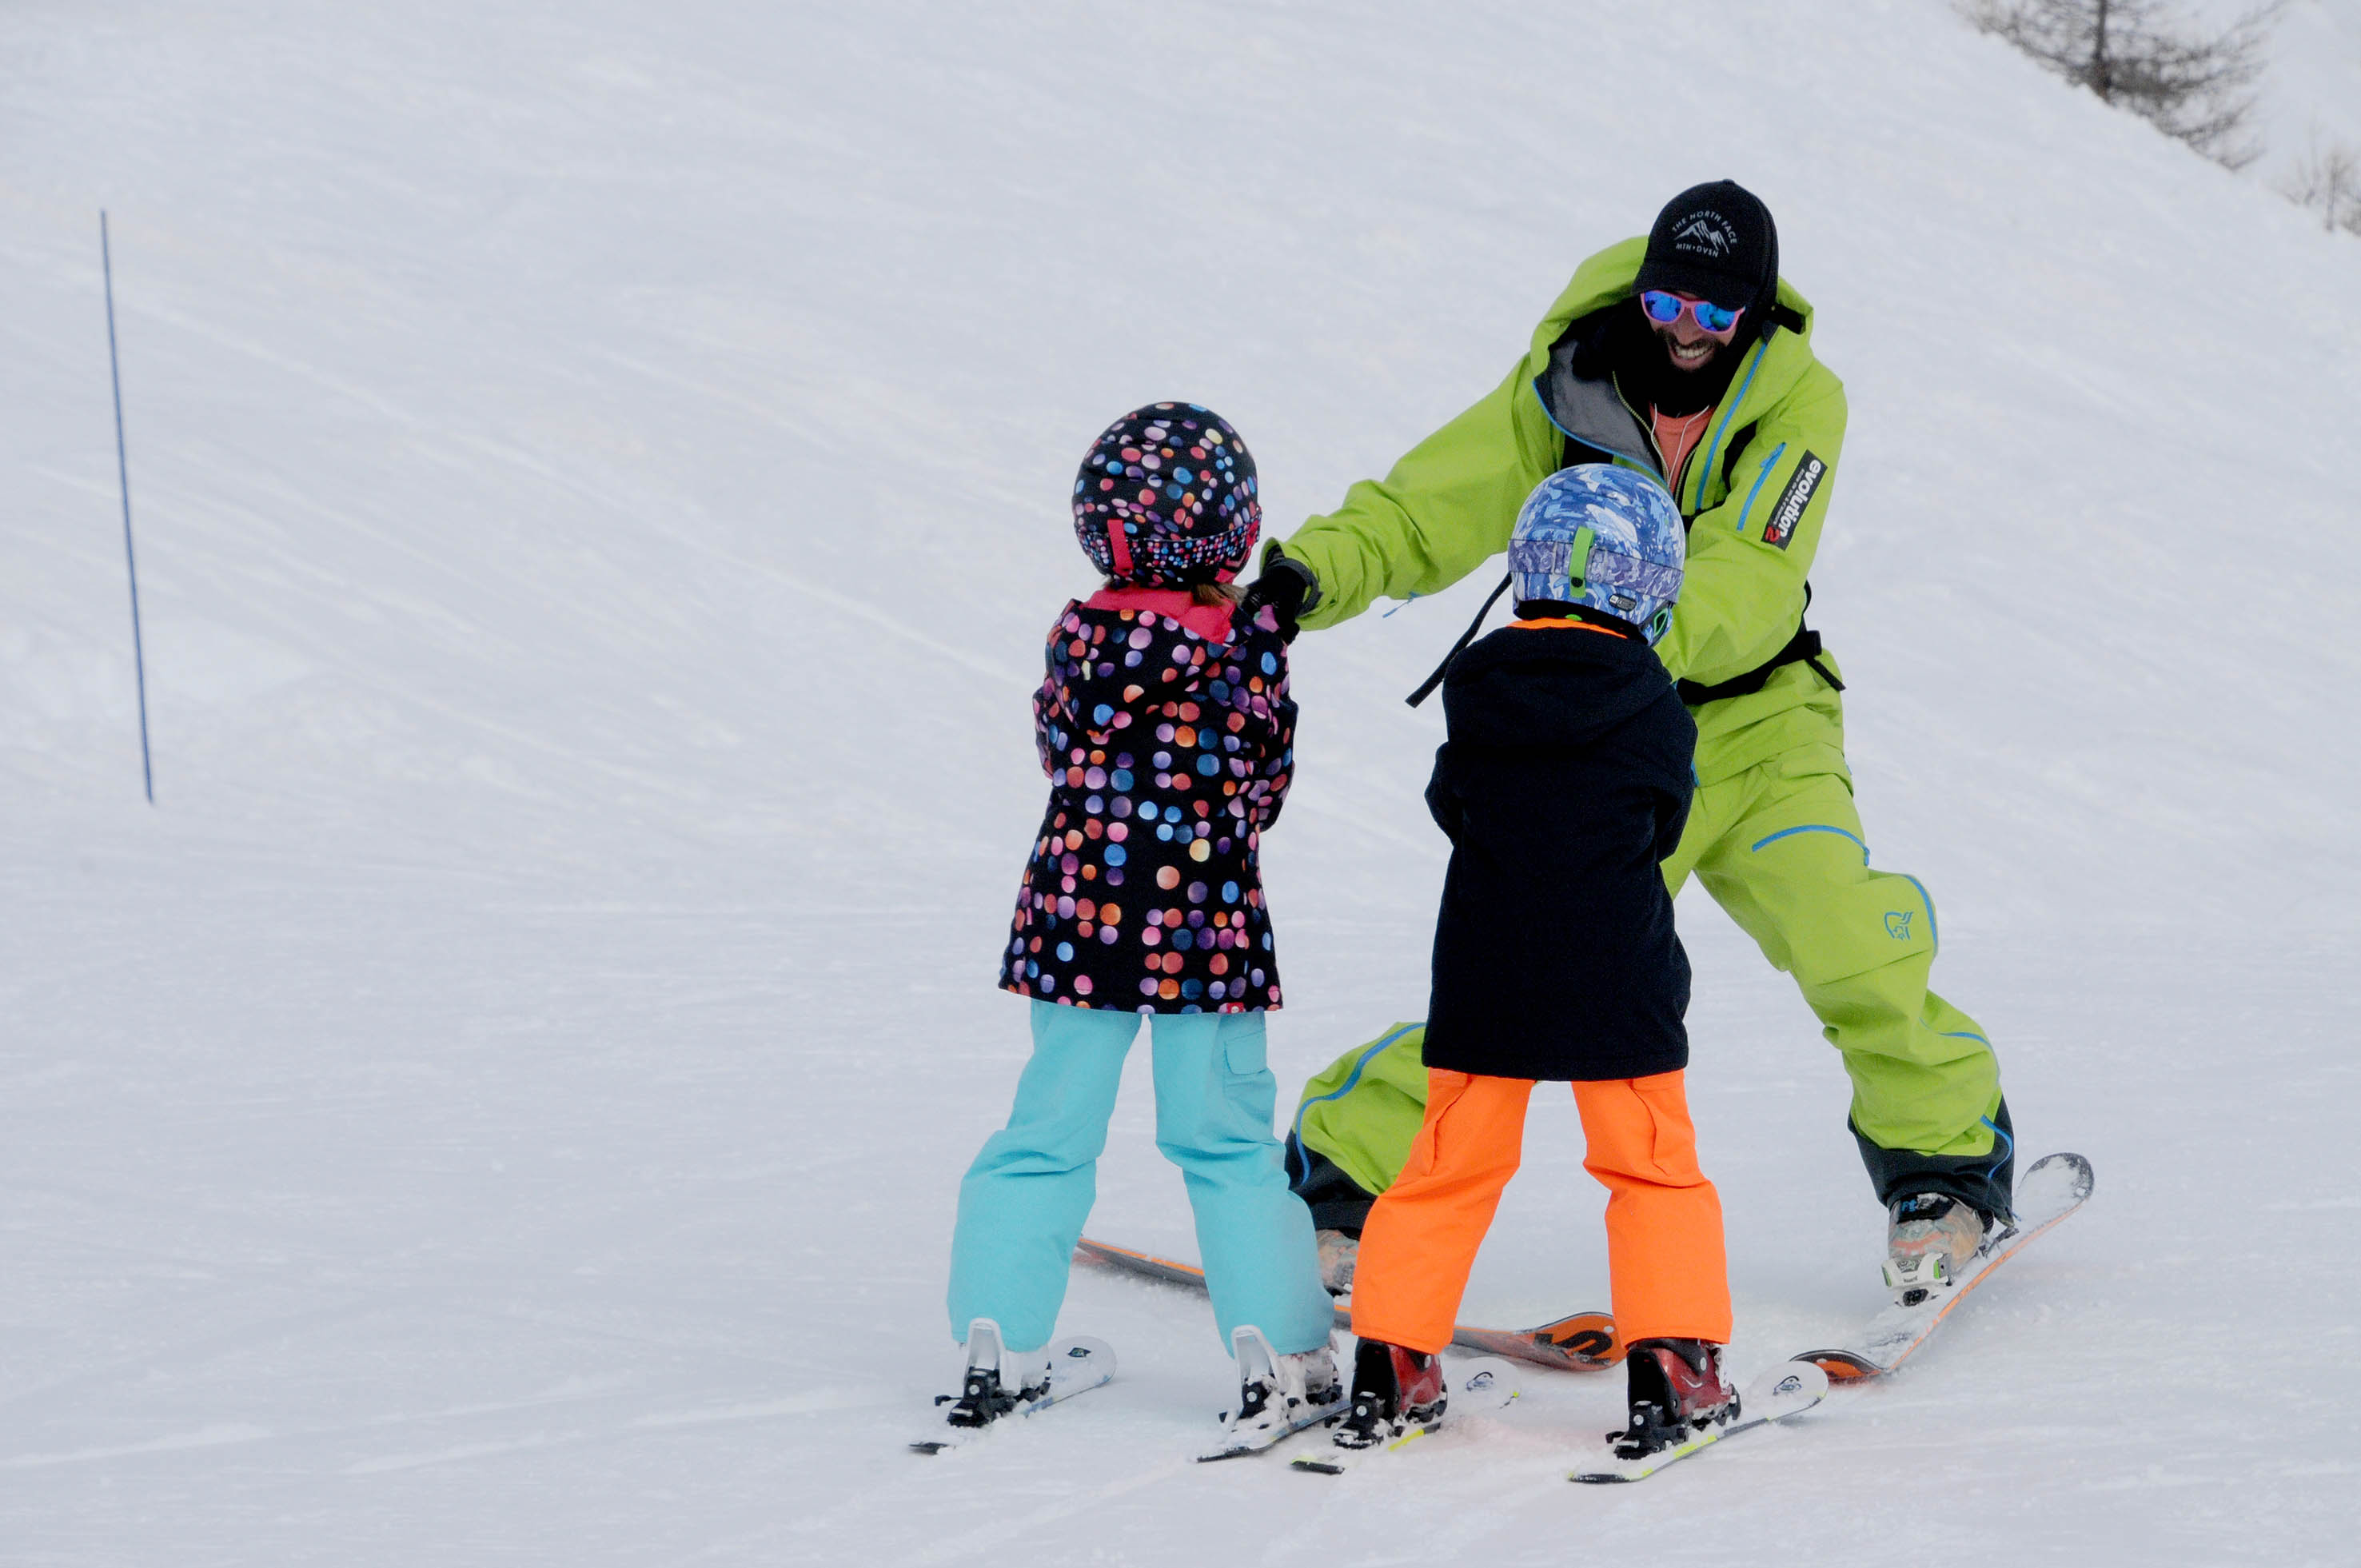 moniteur de ski à vars evolution2